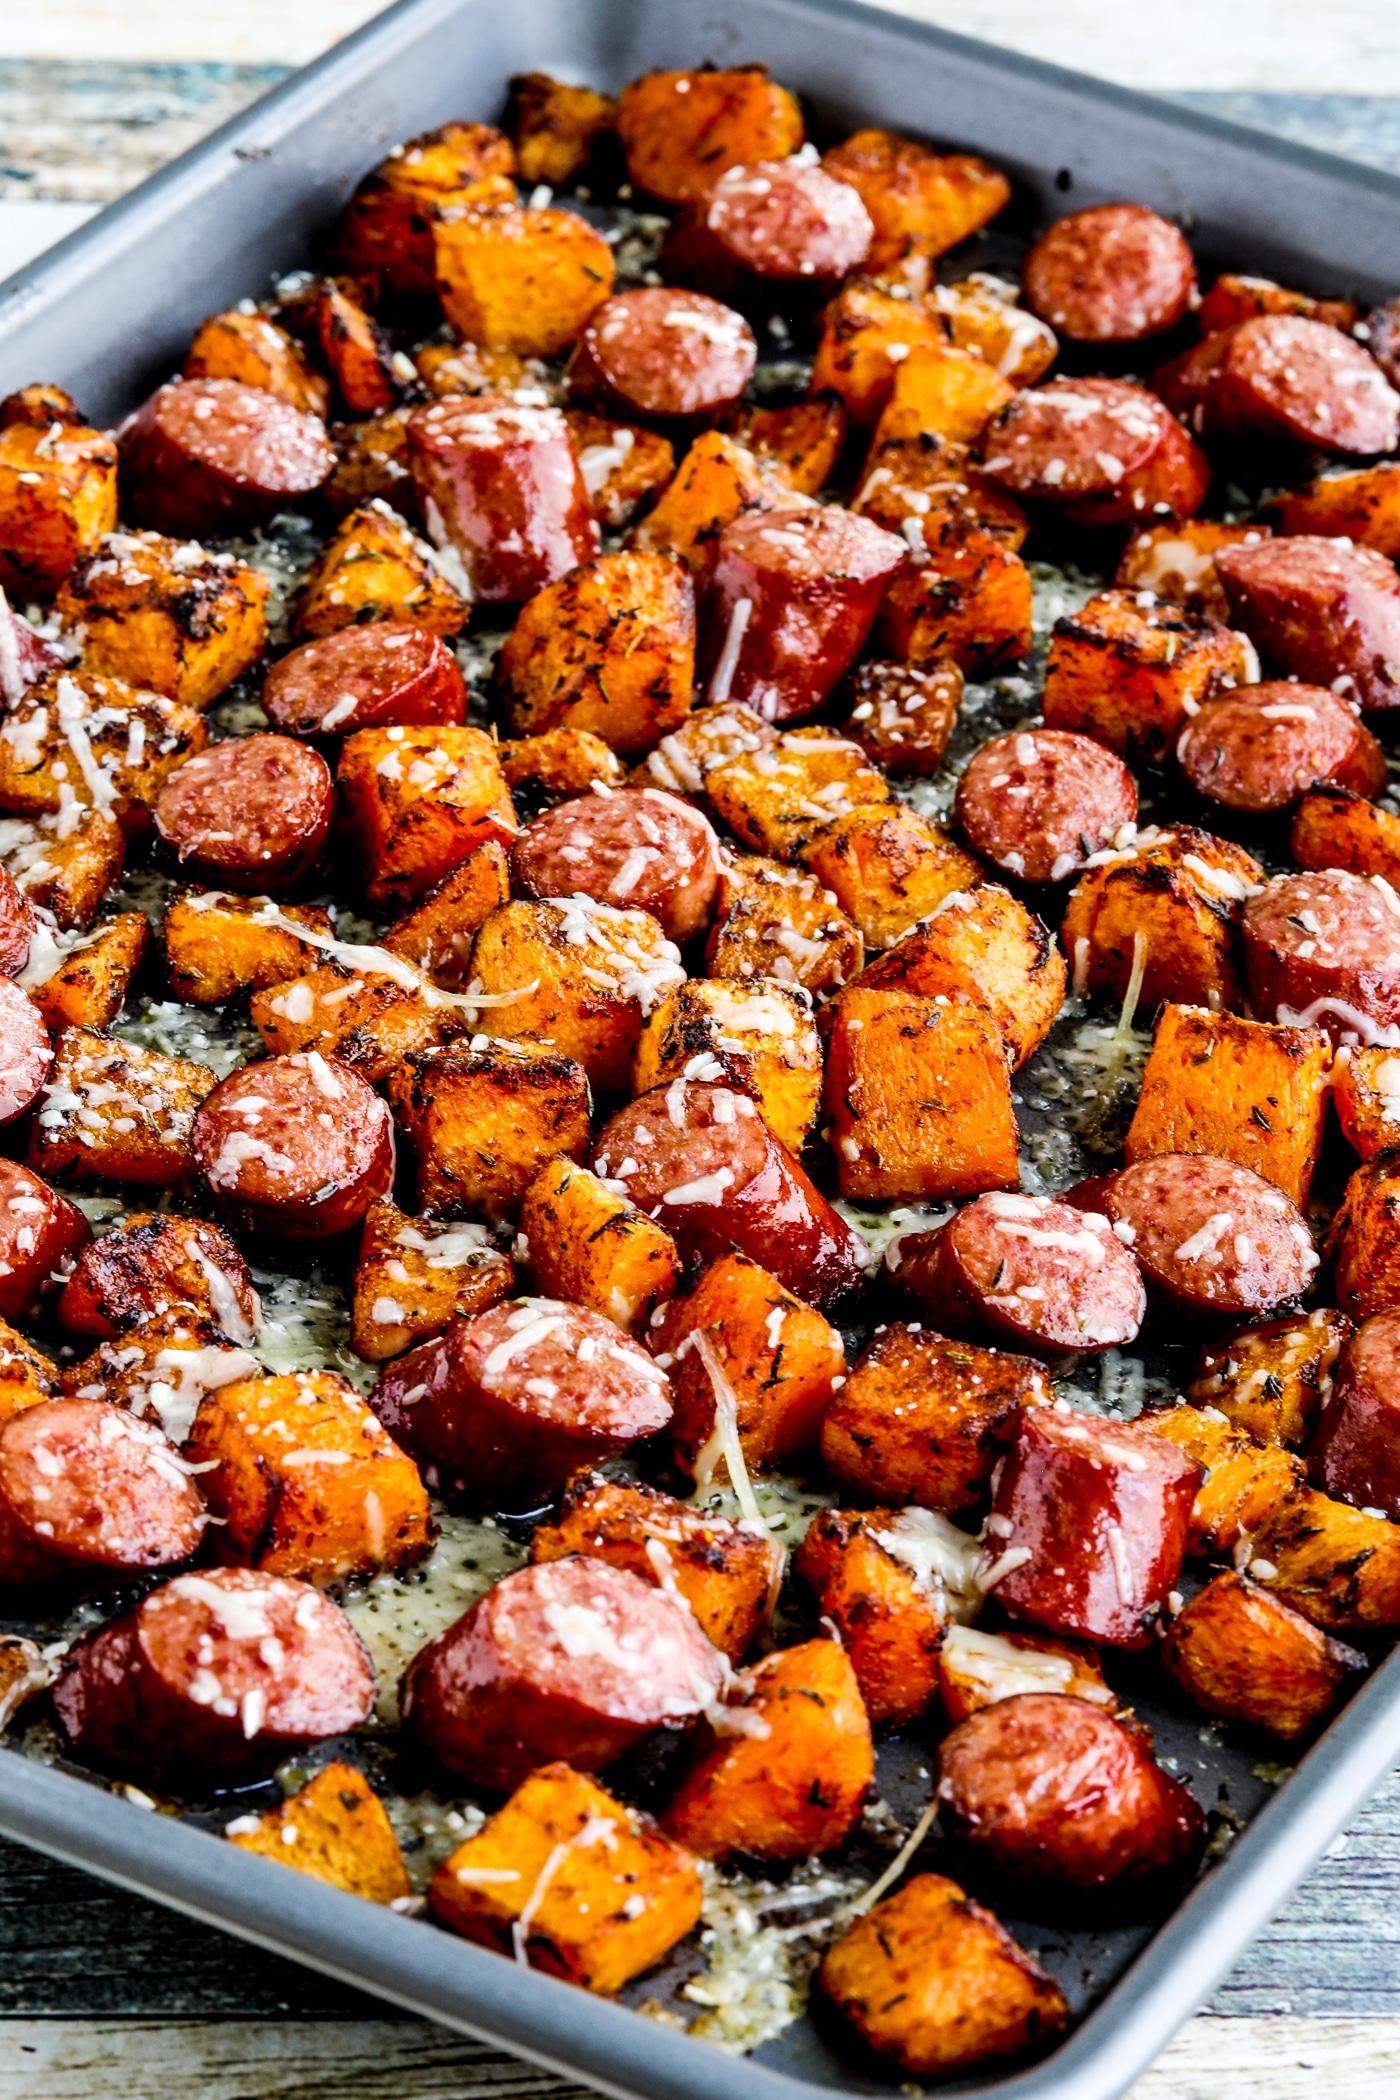 Roasted Butternut Squash and Sausage Sheet Pan Meal  Kalyn